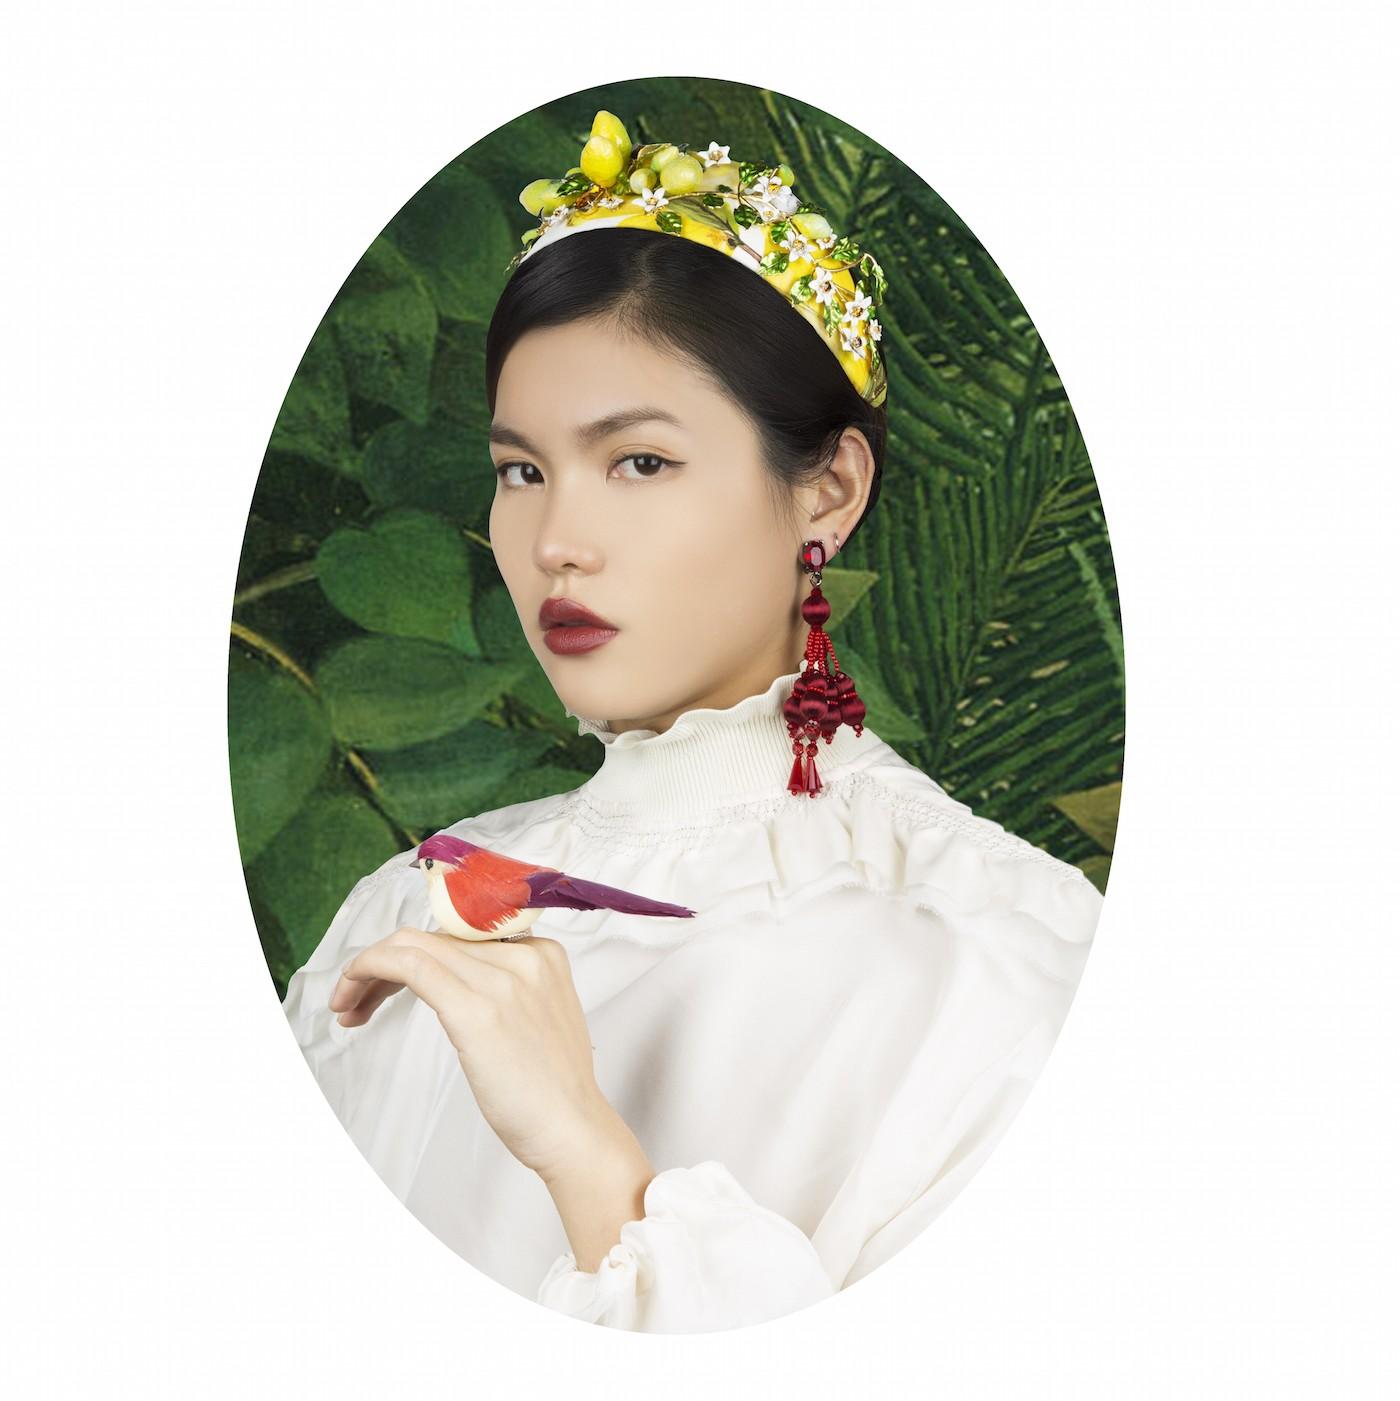 hailun ma's radical renaissance portraits of asian women ...